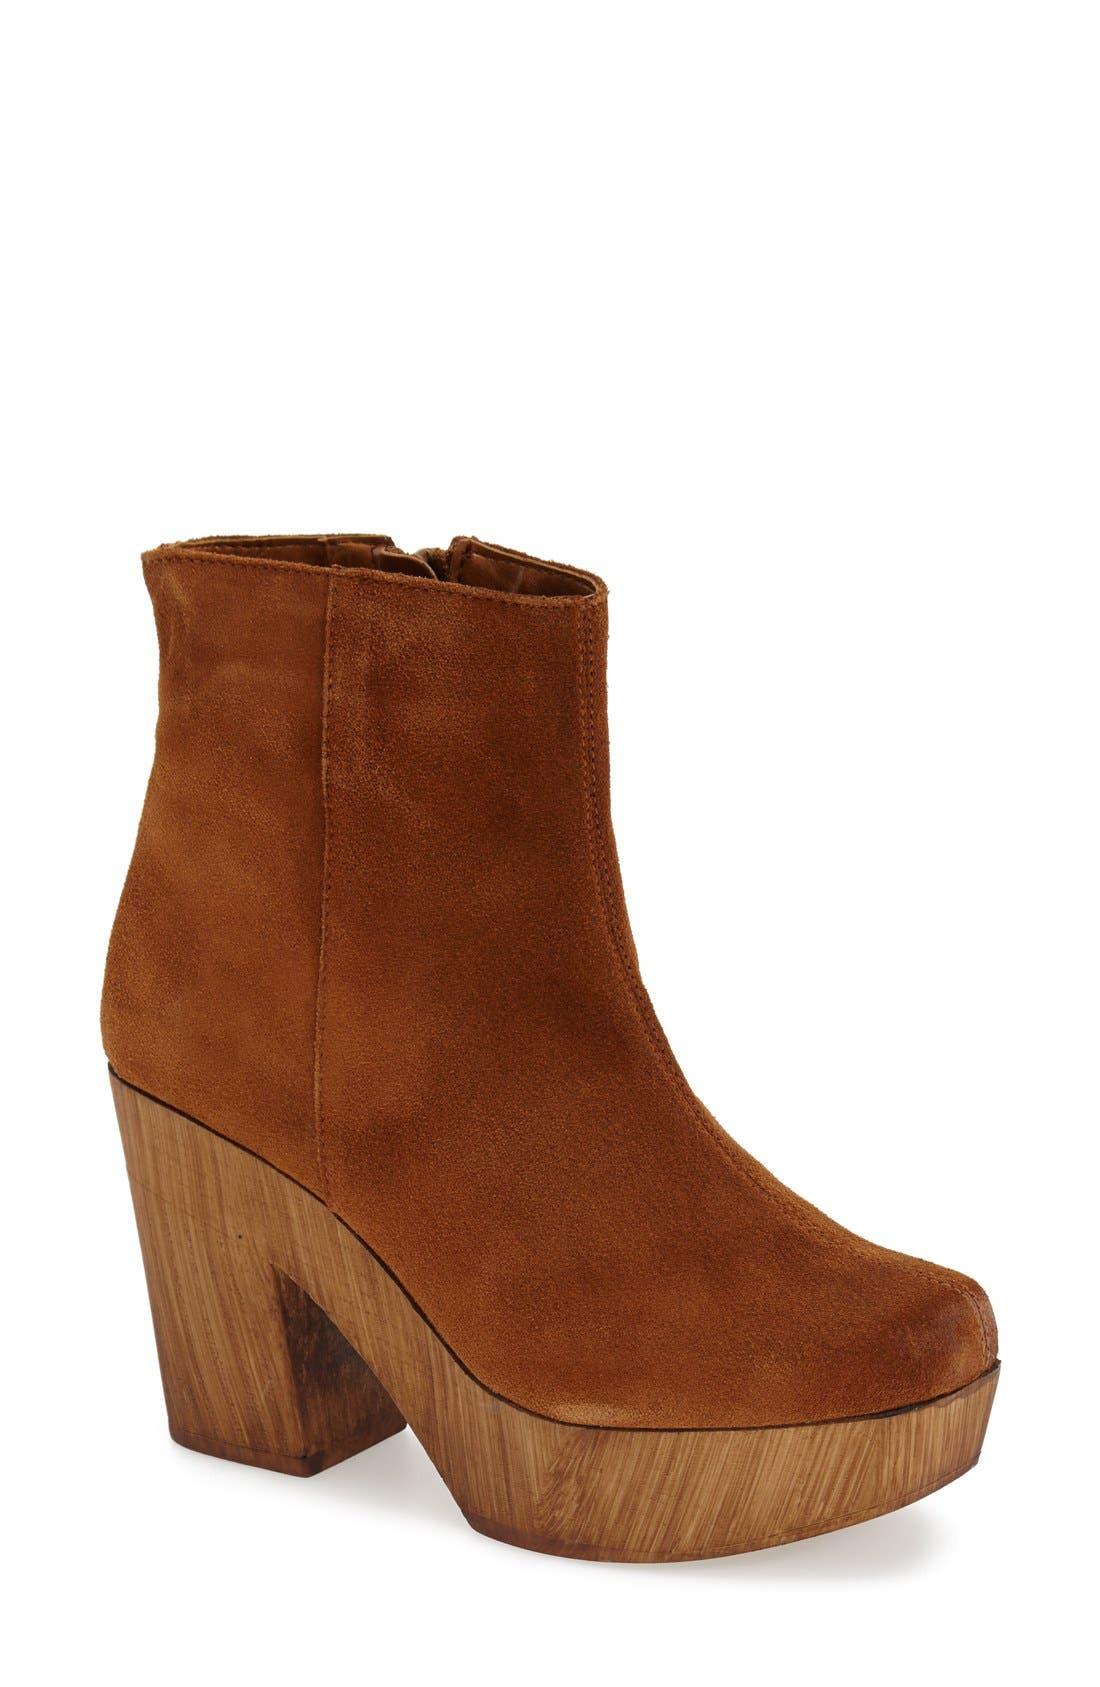 Main Image - Topshop 'Hitch' Platform Chelsea Boot (Women)